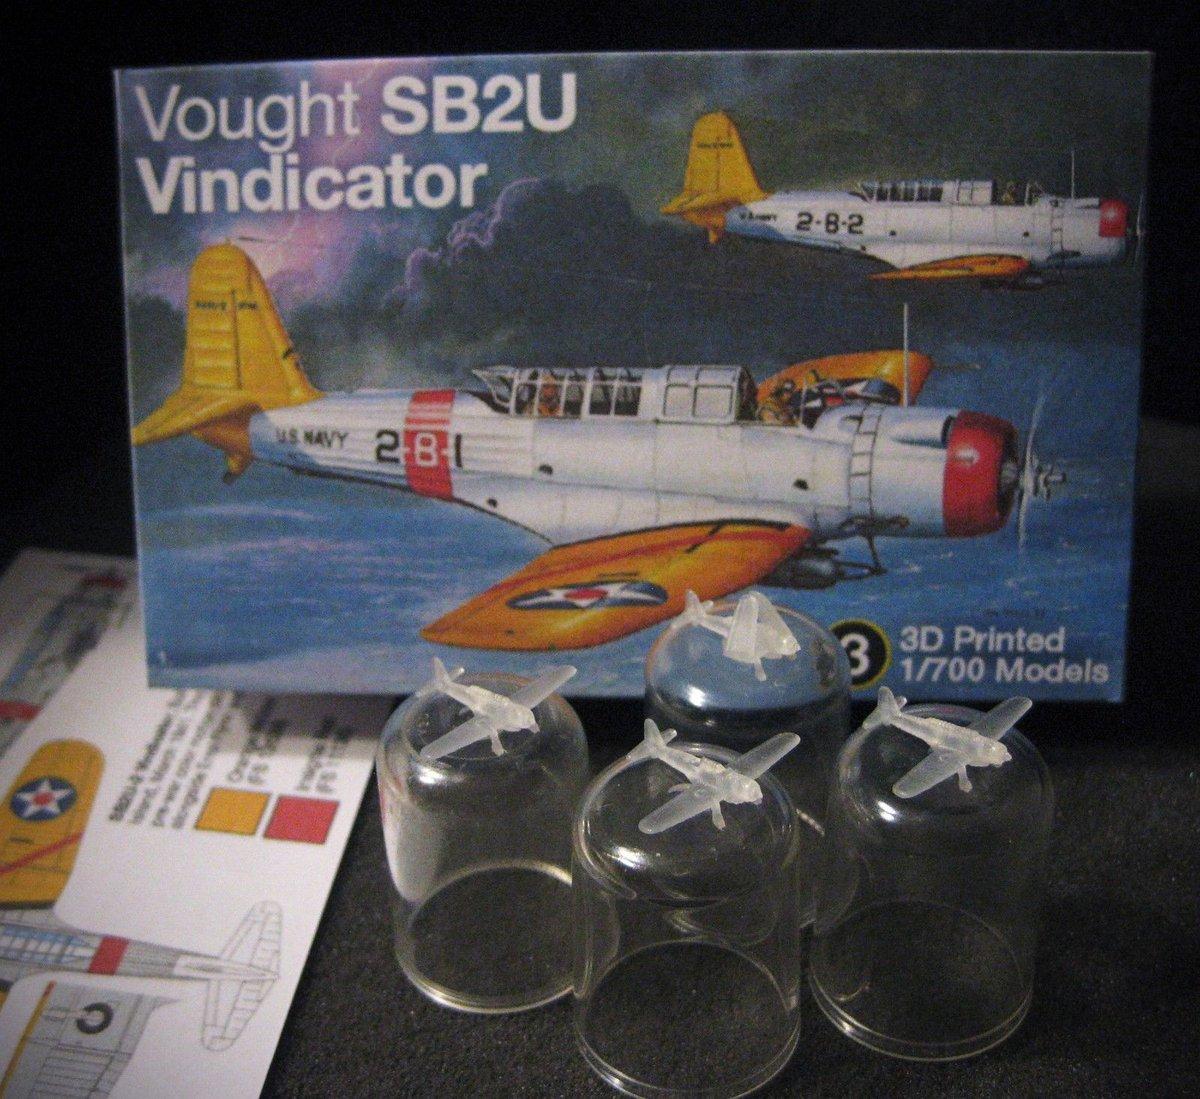 1/700 Vought SB2U Vindicator - (x4) 3D P...